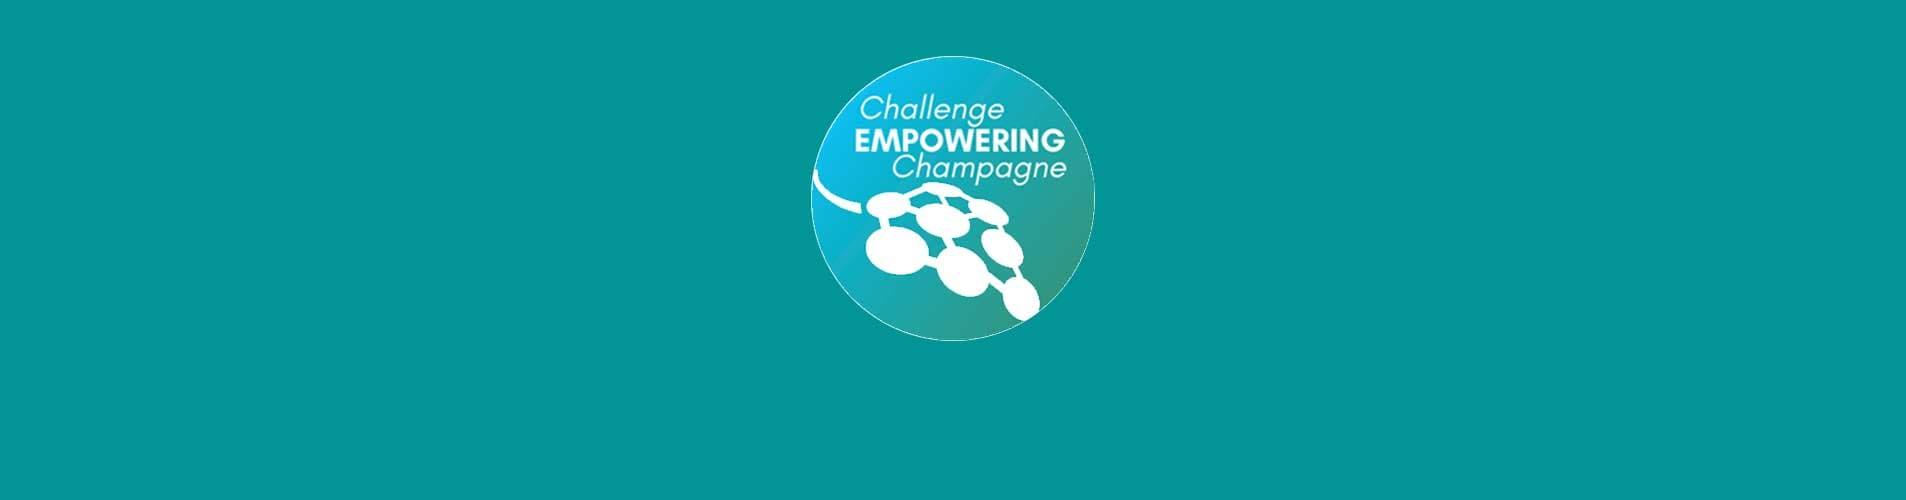 challenge empowering champagne credit agricole du nord est